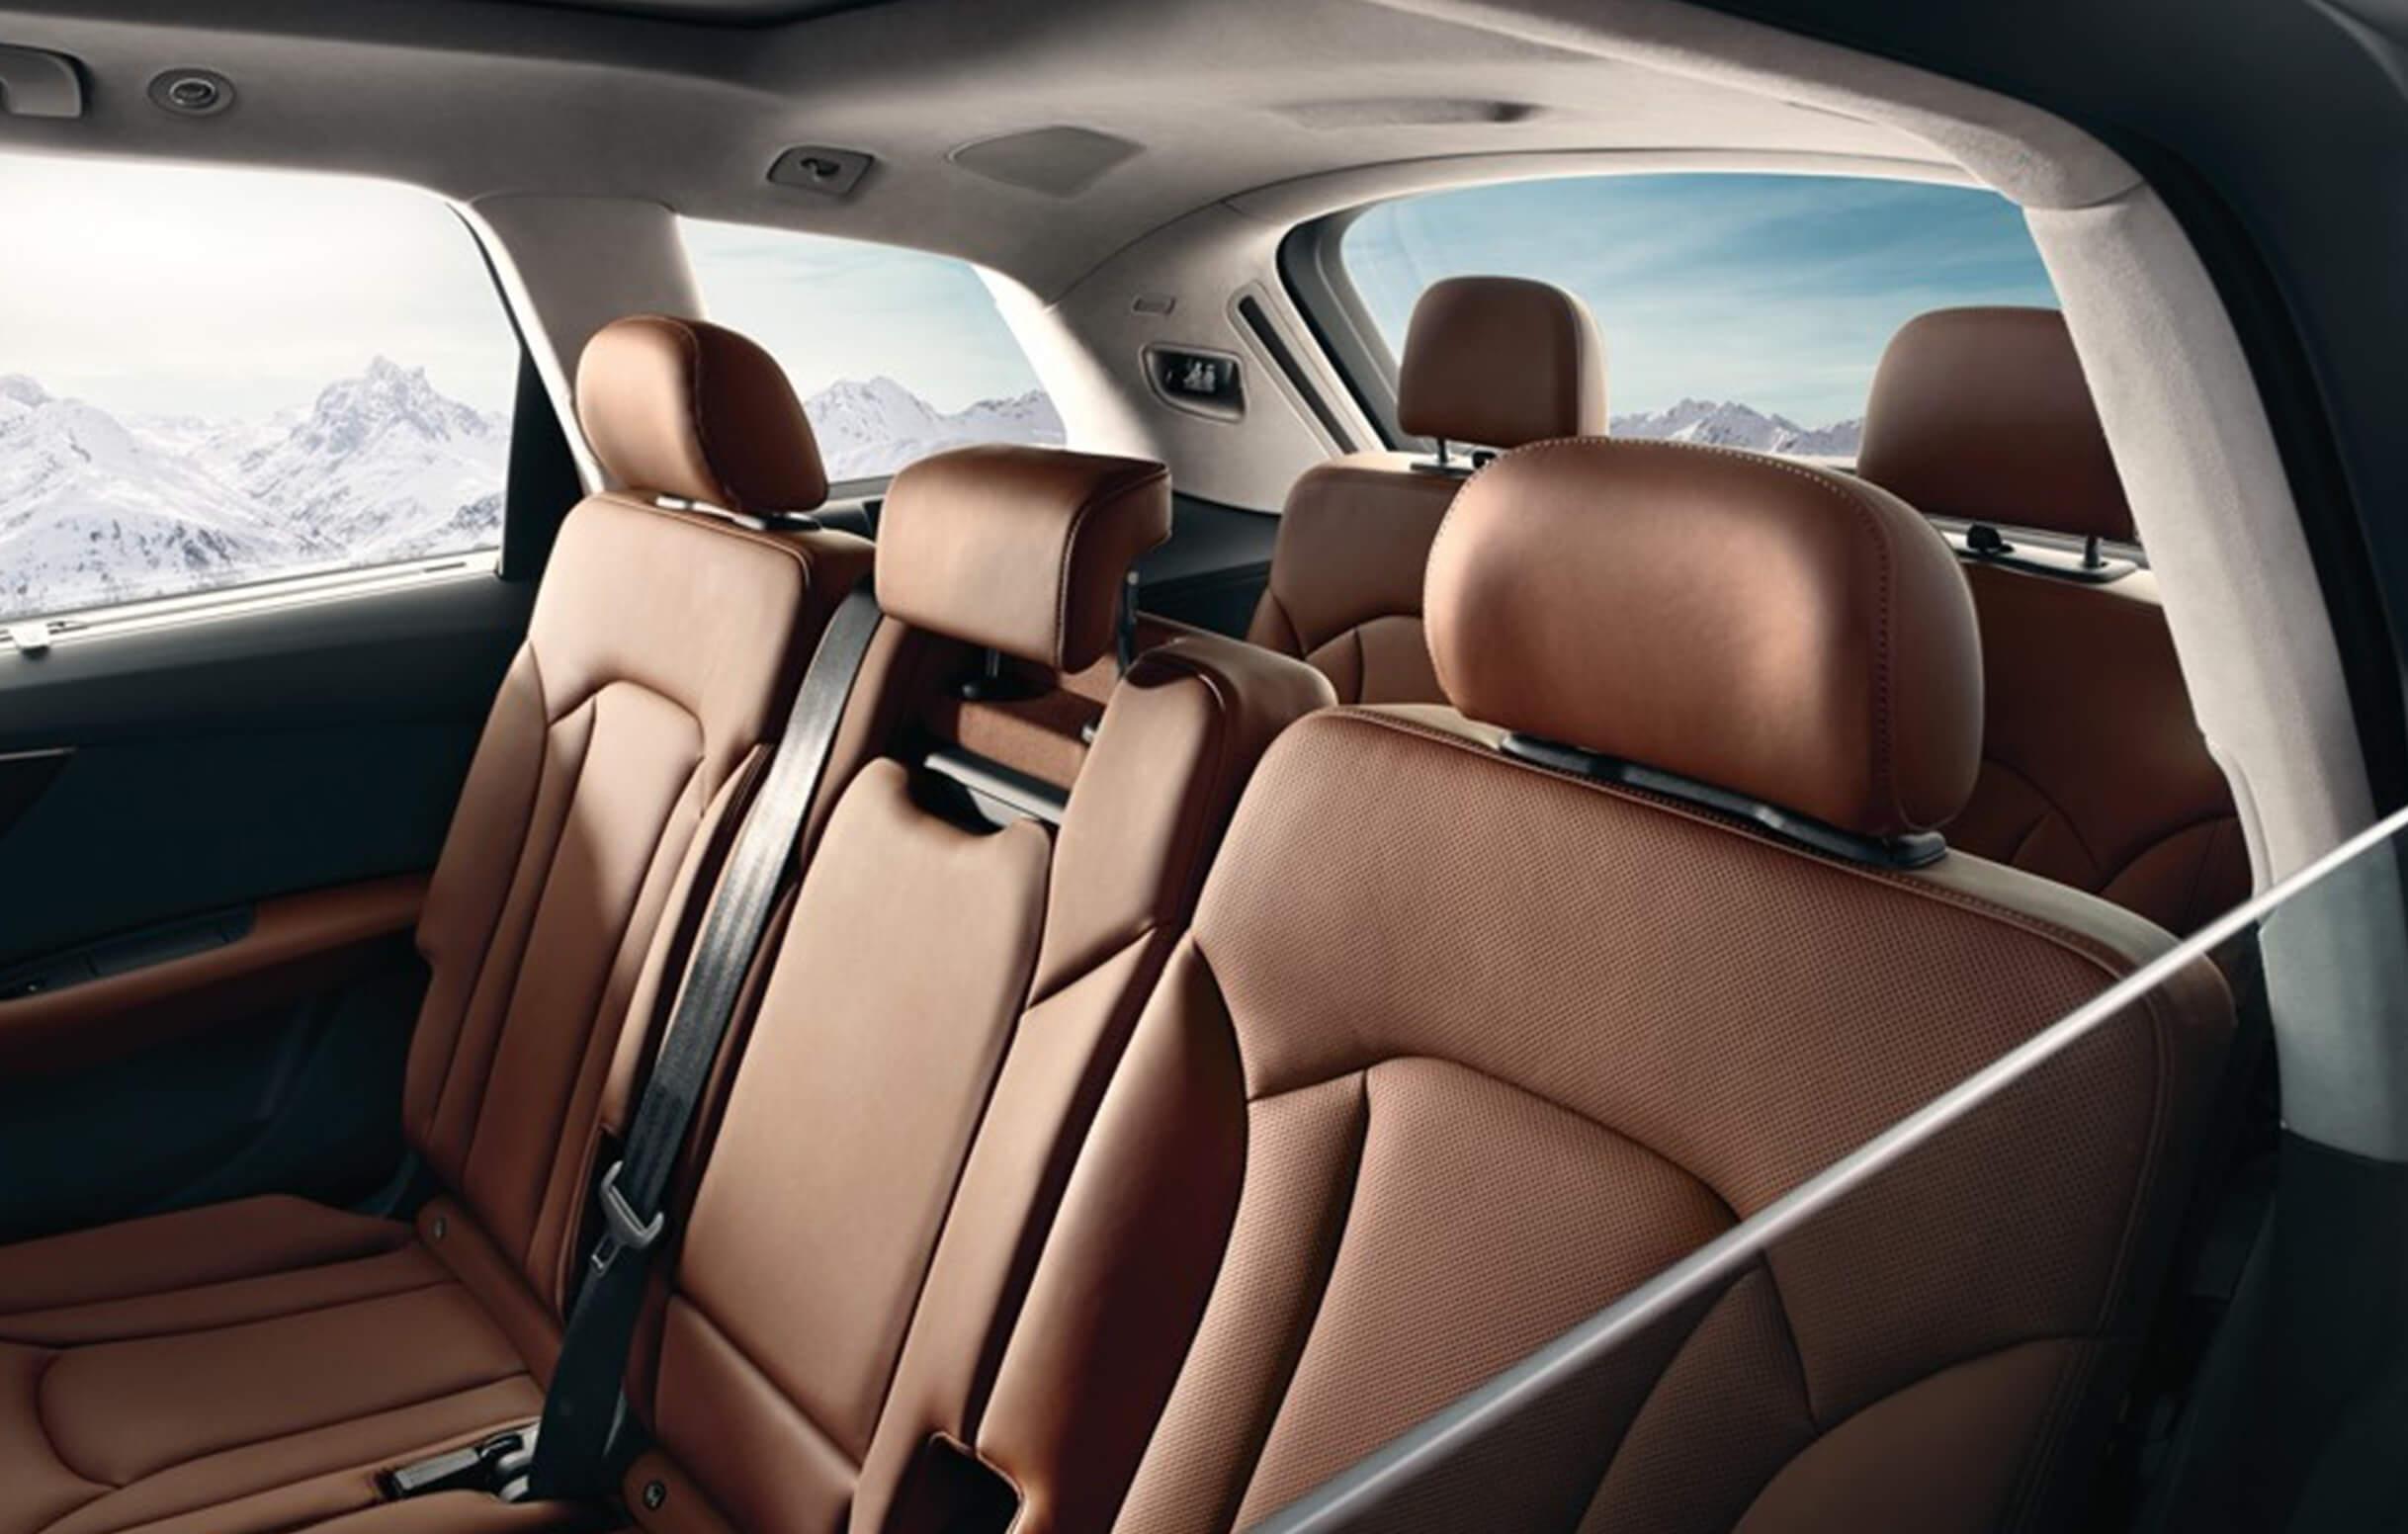 audi-q7-interior – Chariots of Fire Limousines